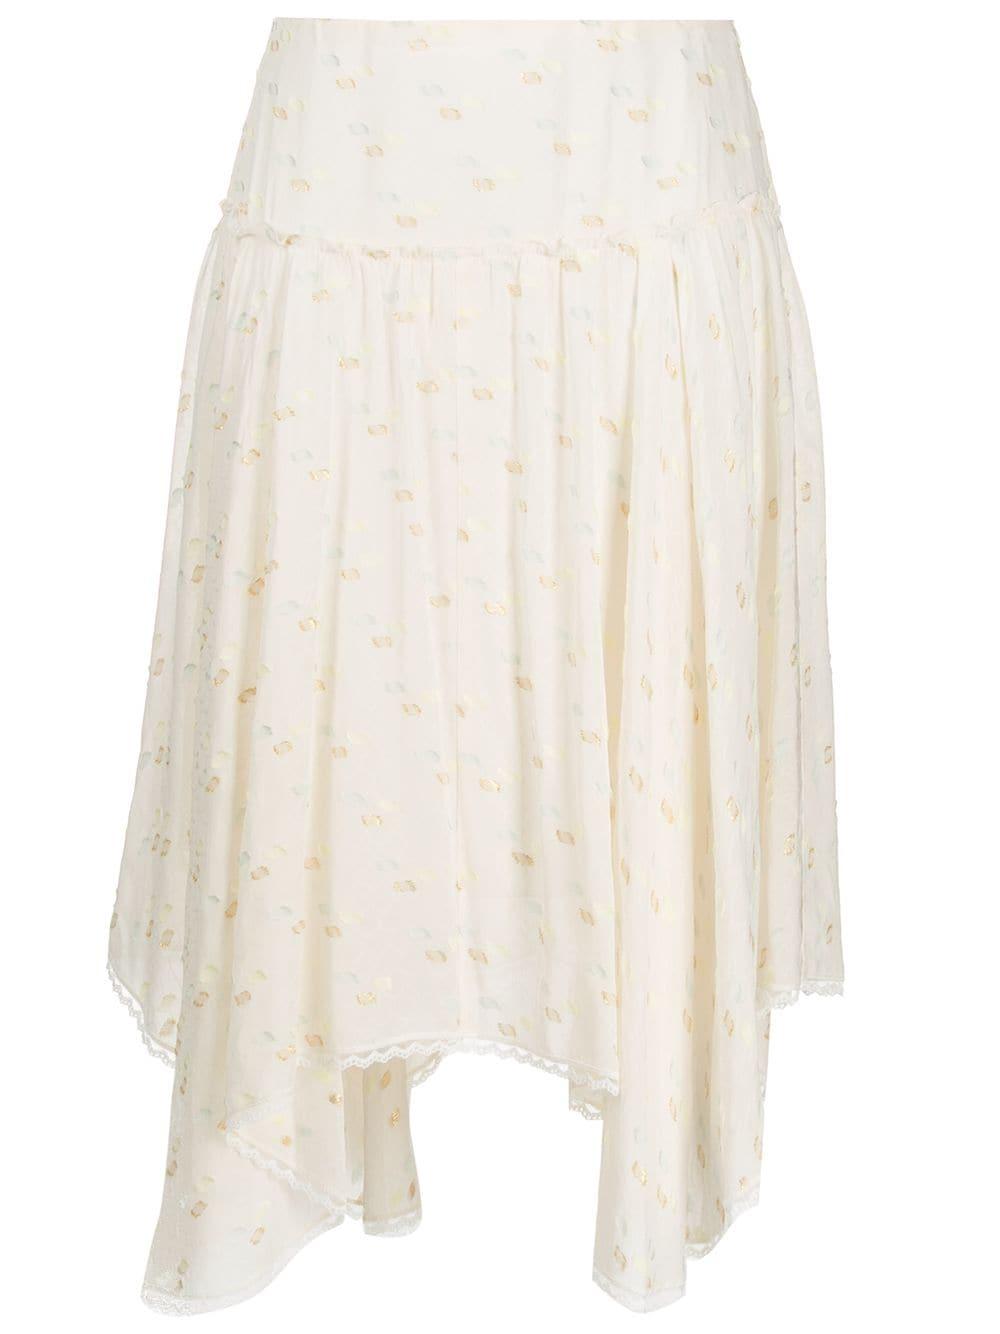 See By Chloé юбка из ткани филькупе